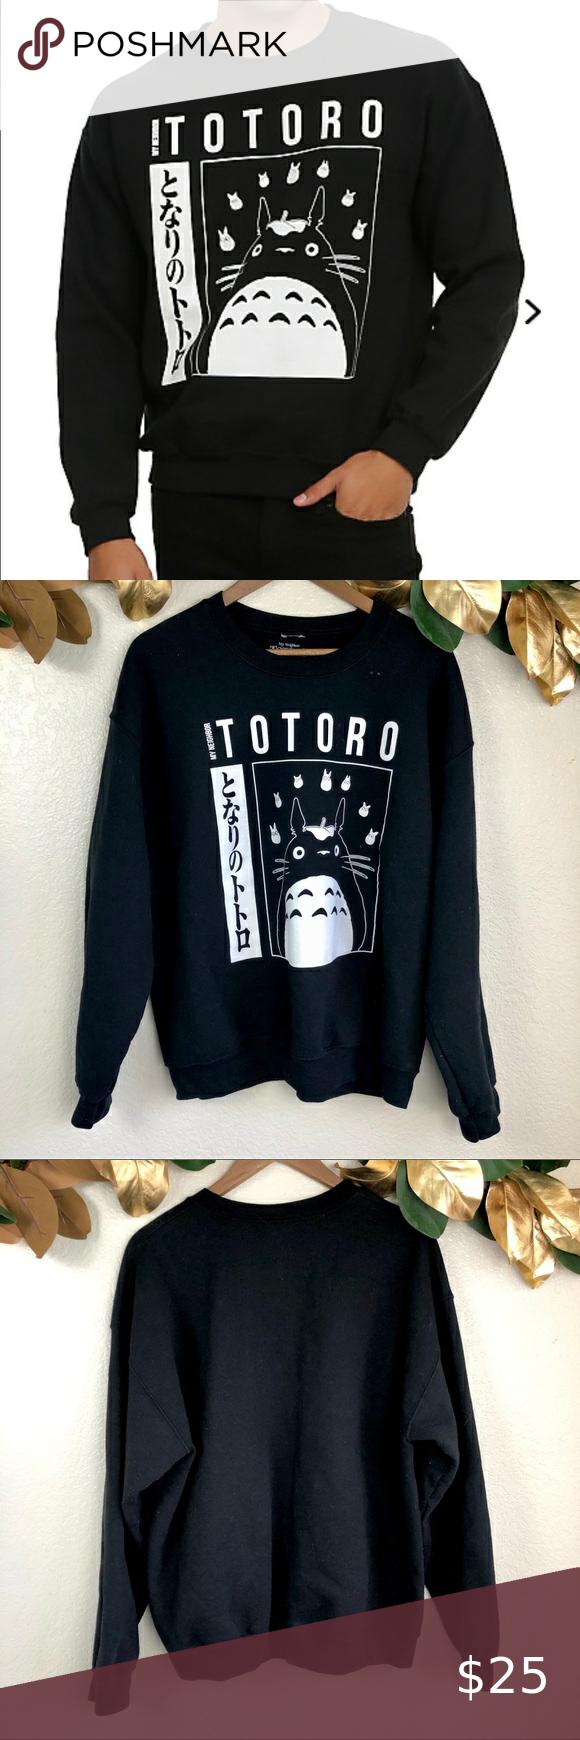 Studio Ghibli My Neighbor Totoro Crew Pullover Black Crewneck Sweatshirt My Neighbor Totoro Pullover [ 1740 x 580 Pixel ]